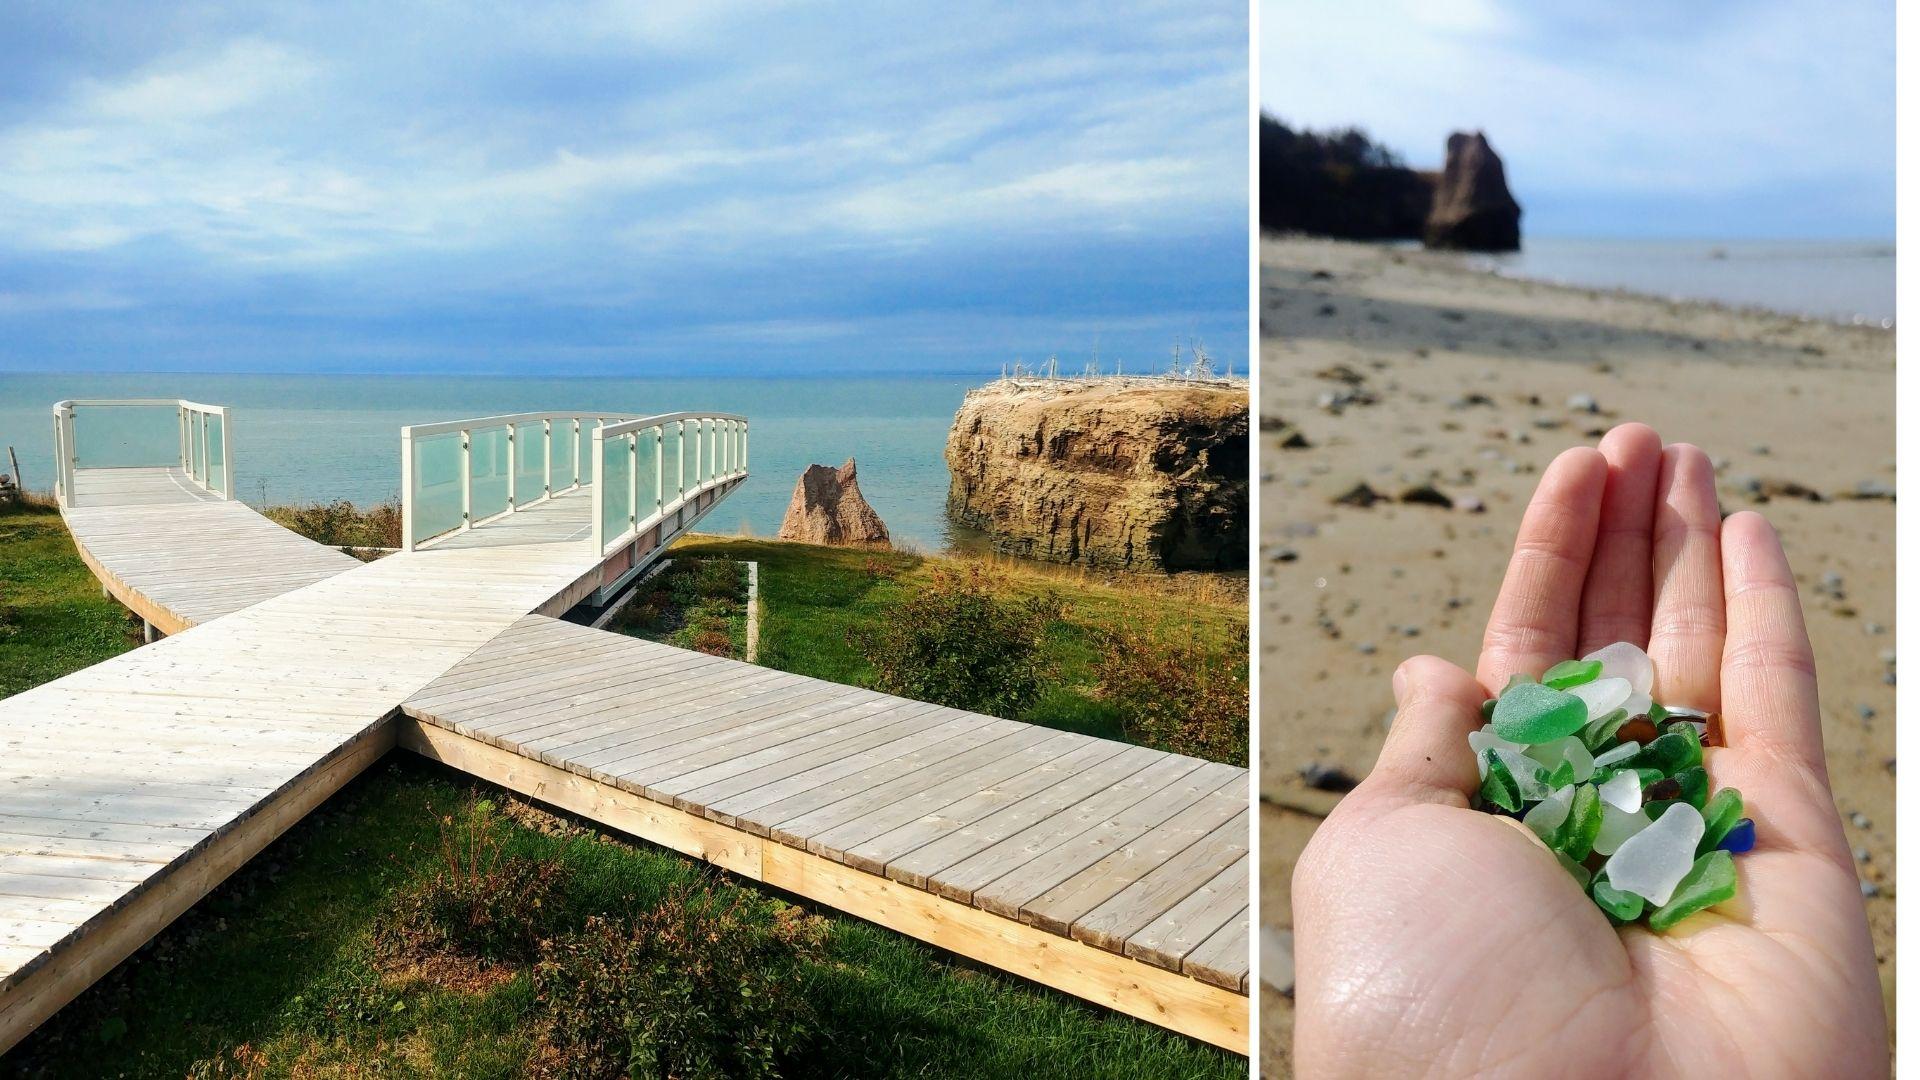 Rocher Pokeshaw plage infos pratiques - Nouveau-Brunswick, Canada